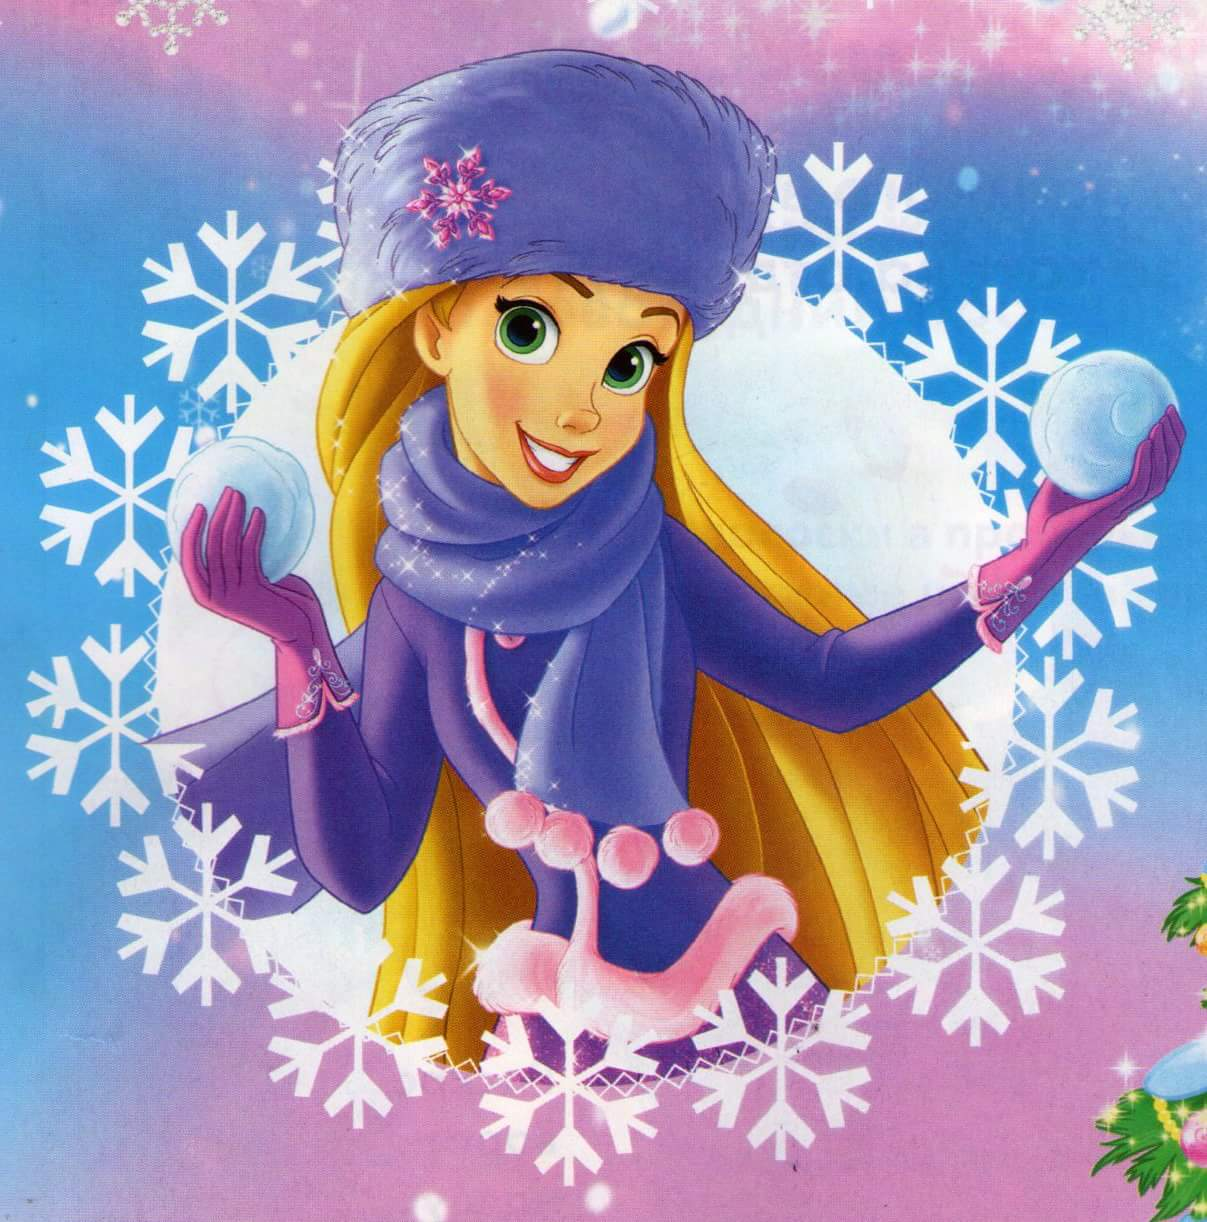 Disney Princess Images Winter Princesses Rapunzel Hd Wallpaper And